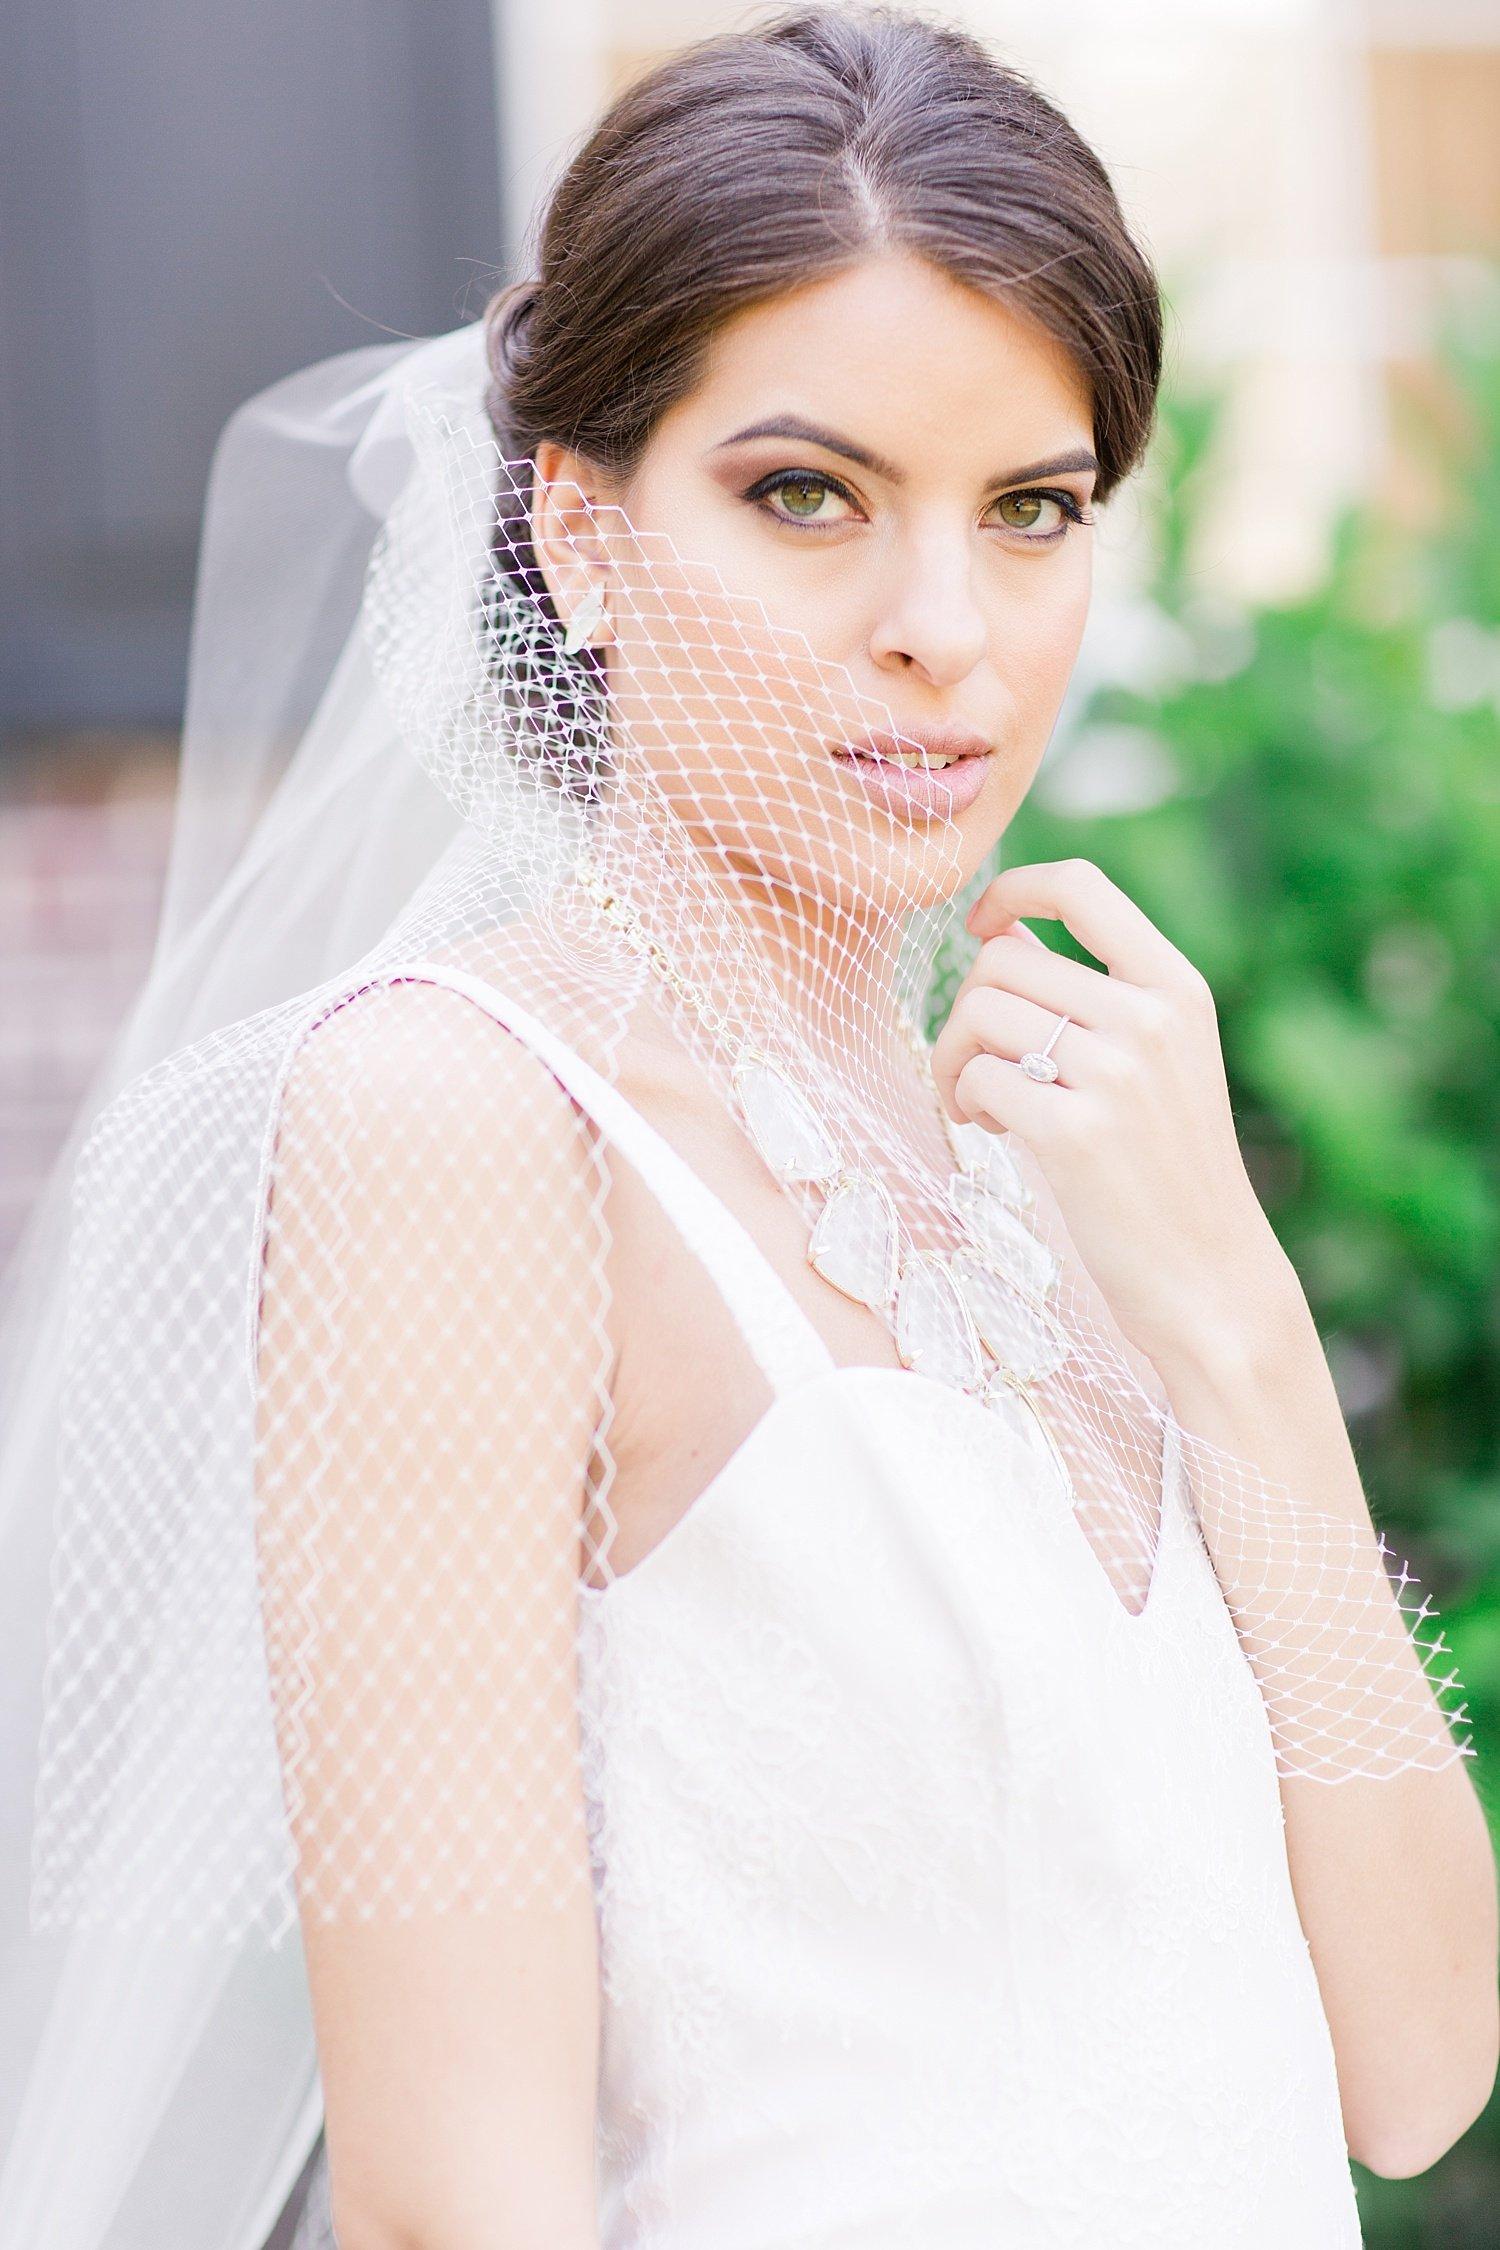 rachel-strickland-photography-katie-may-ivory-and-beau-bridal-boutique-bethesda-academy-wedding-whitfield-chapel-wedding-savannah-bridal-boutique-savannah-weddings-savannah-wedding-savannah-wedding-planner-savannah-bridal-gowns-savannah-bride-3.jpg